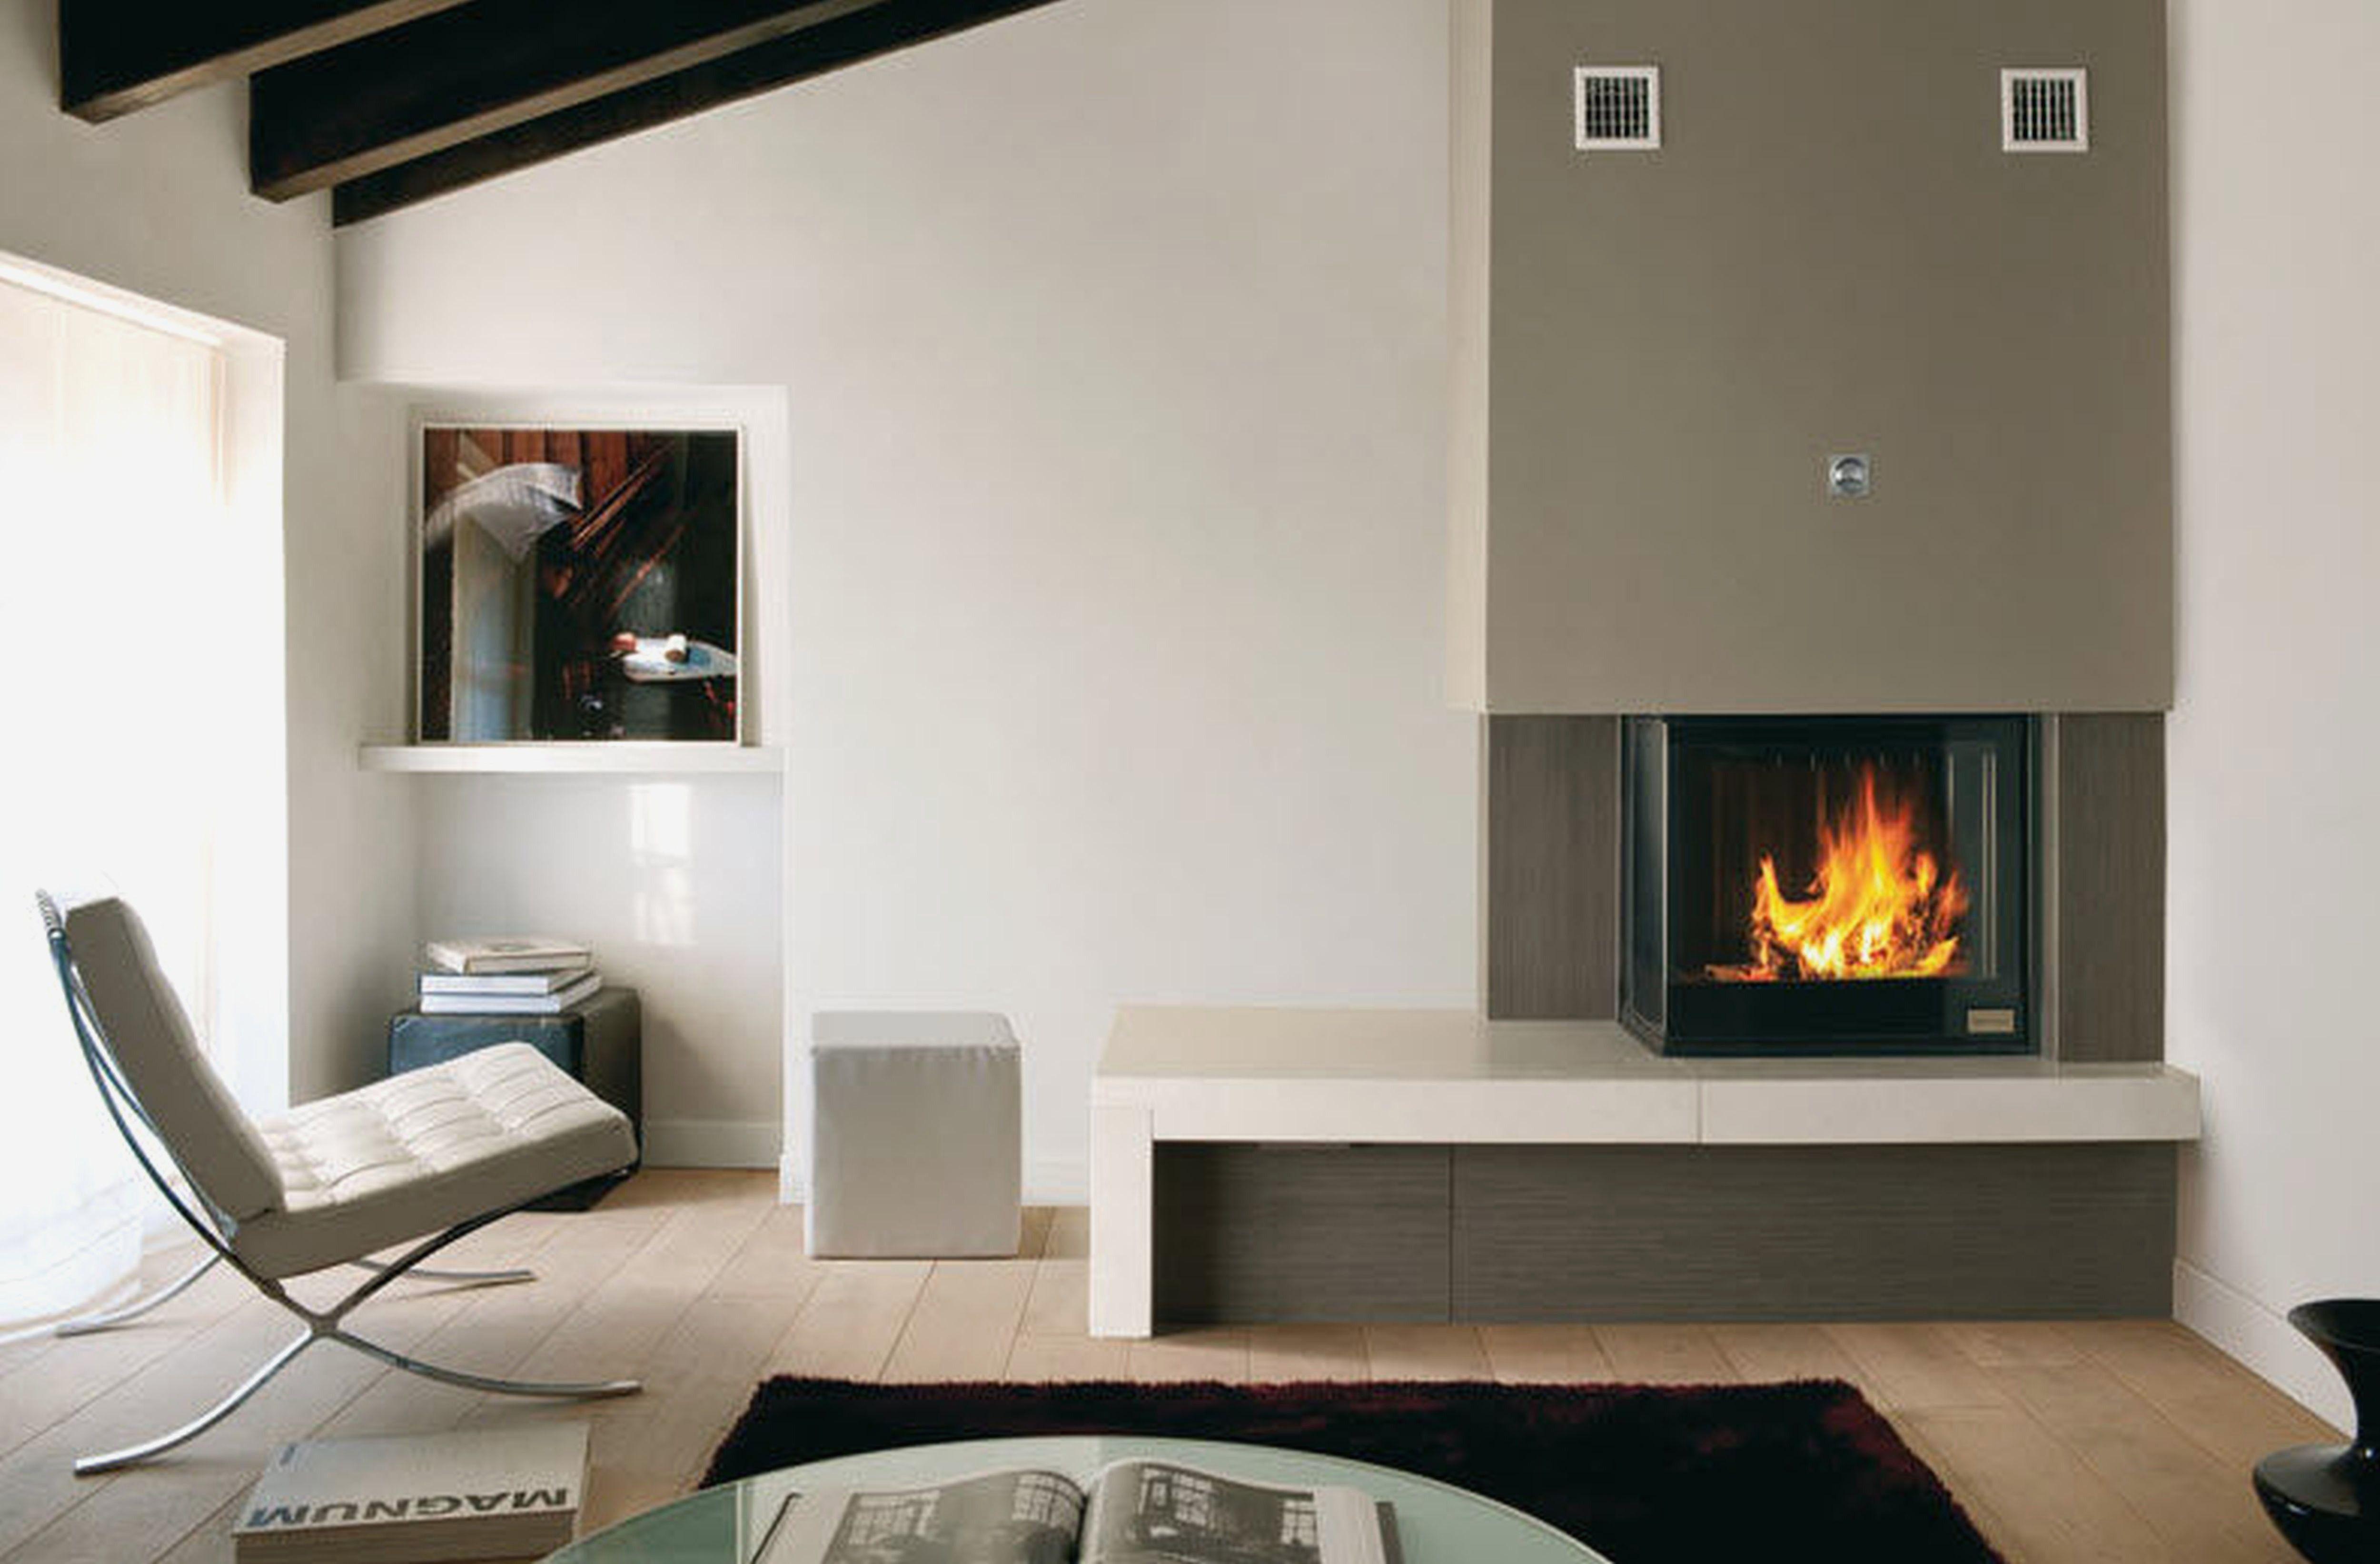 Kamin Ecke Einheiten Kachelofen Kachelofen Fireplace Design